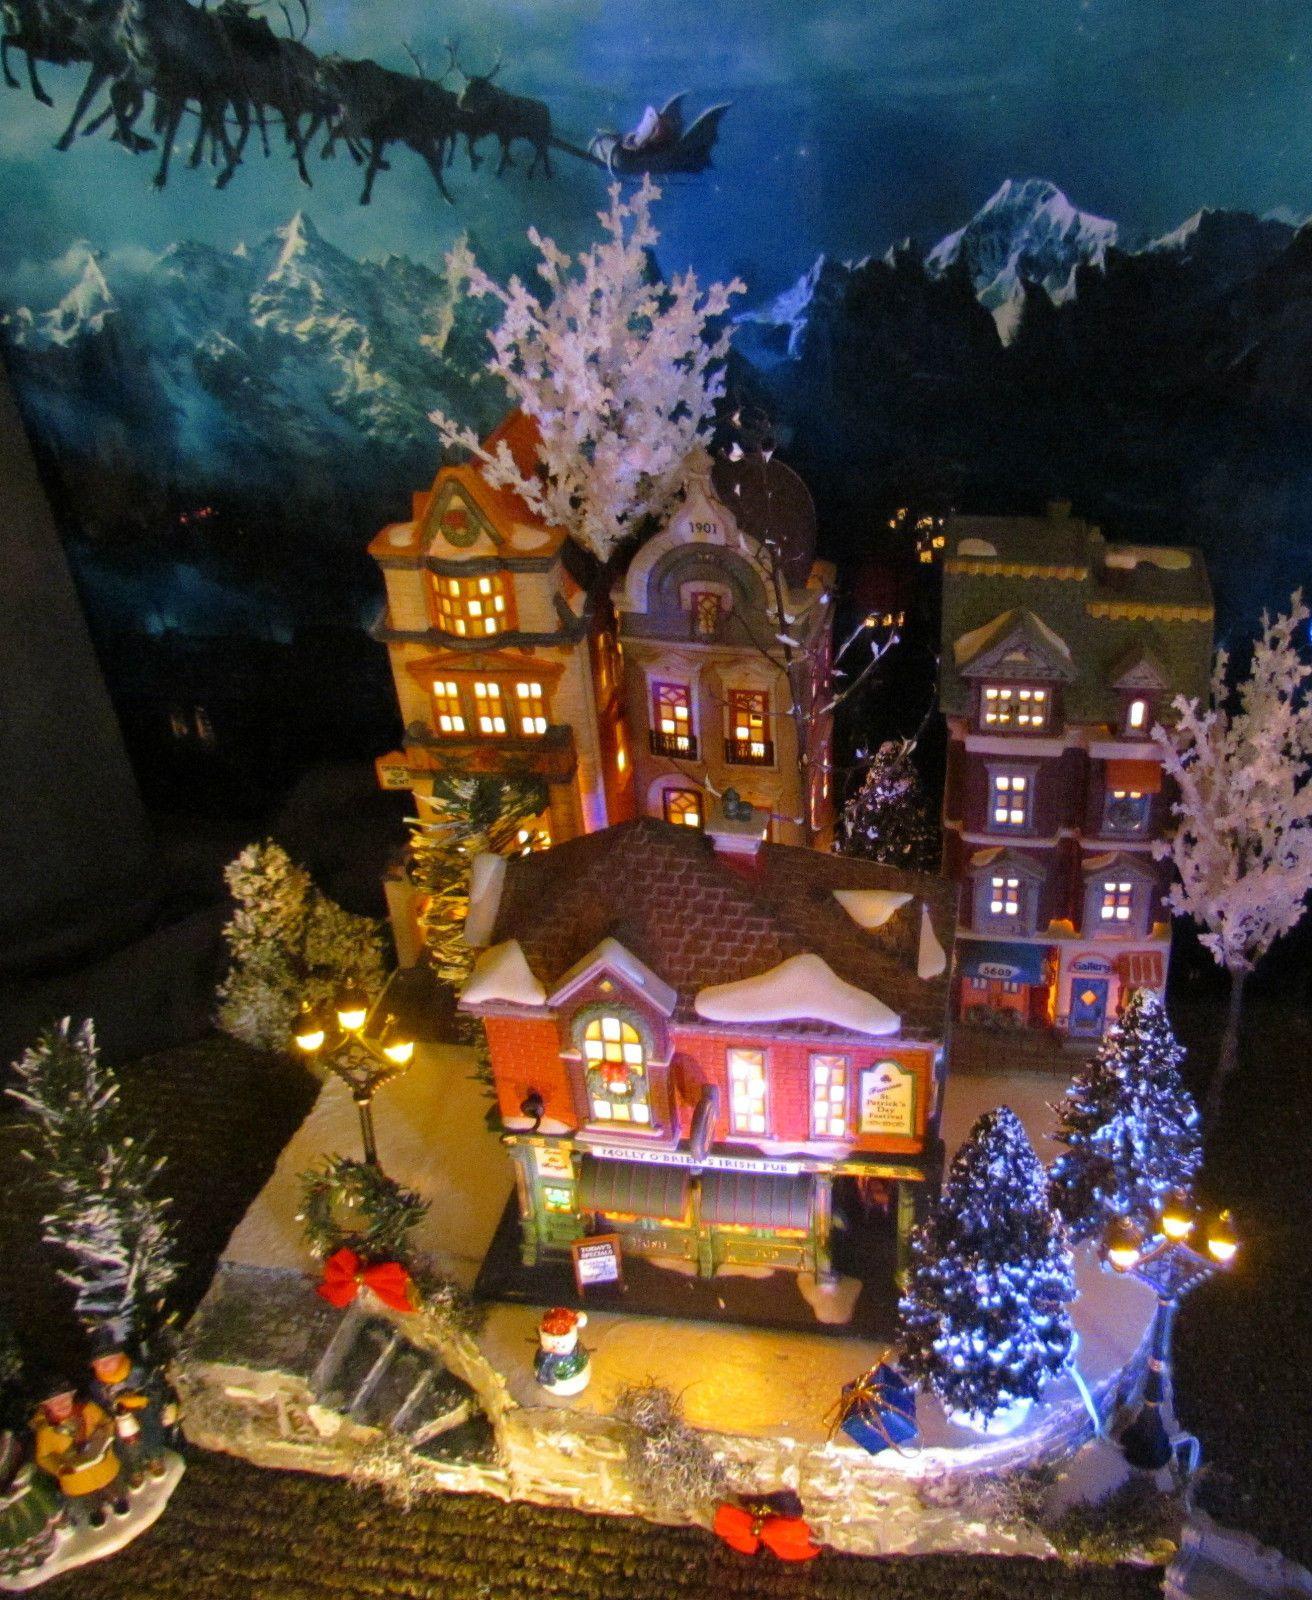 Christmas Village Platforms For Sale.Details About Multi Level Curved Christmas Village Display